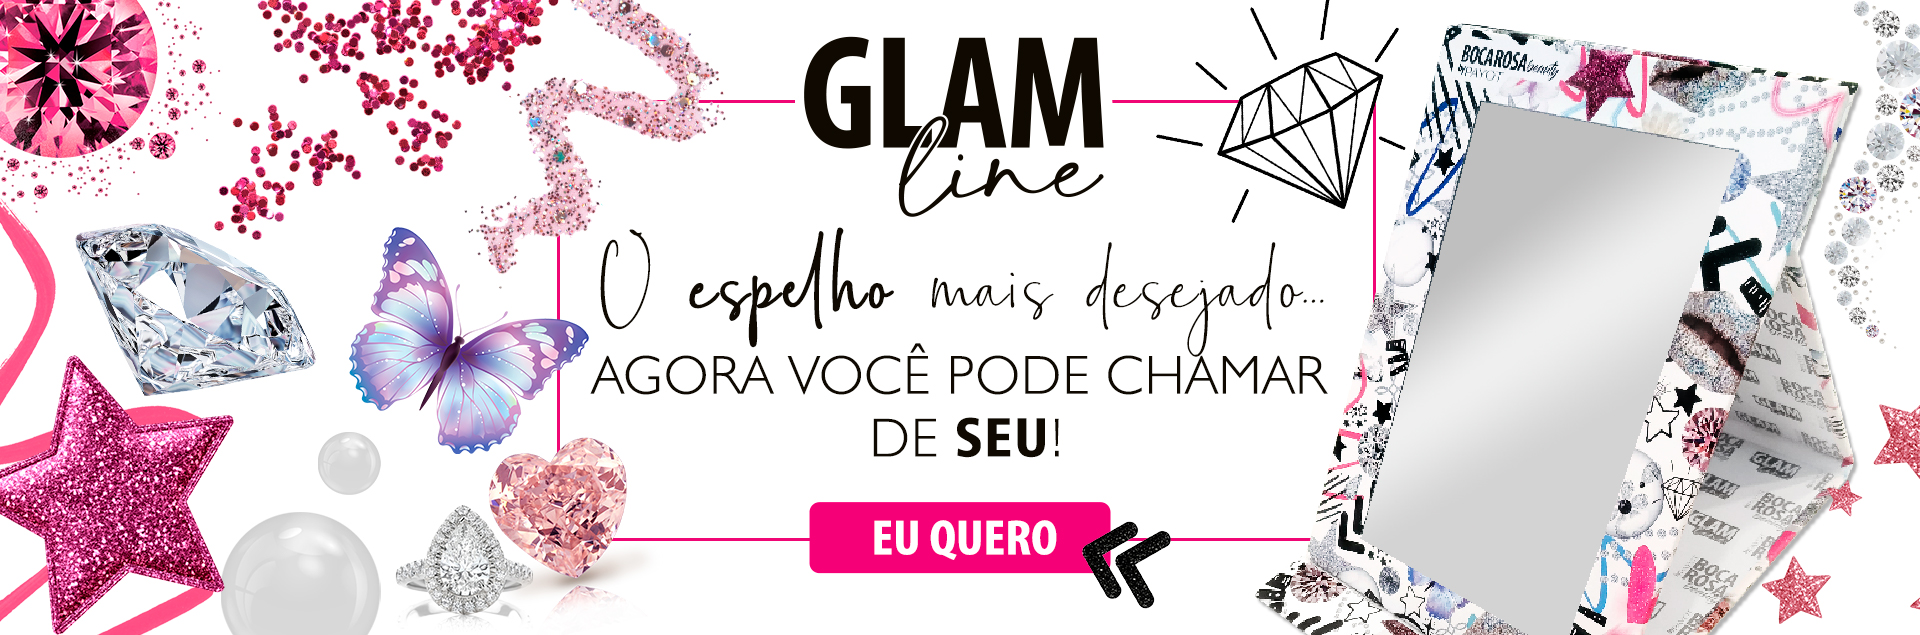 Glam Line